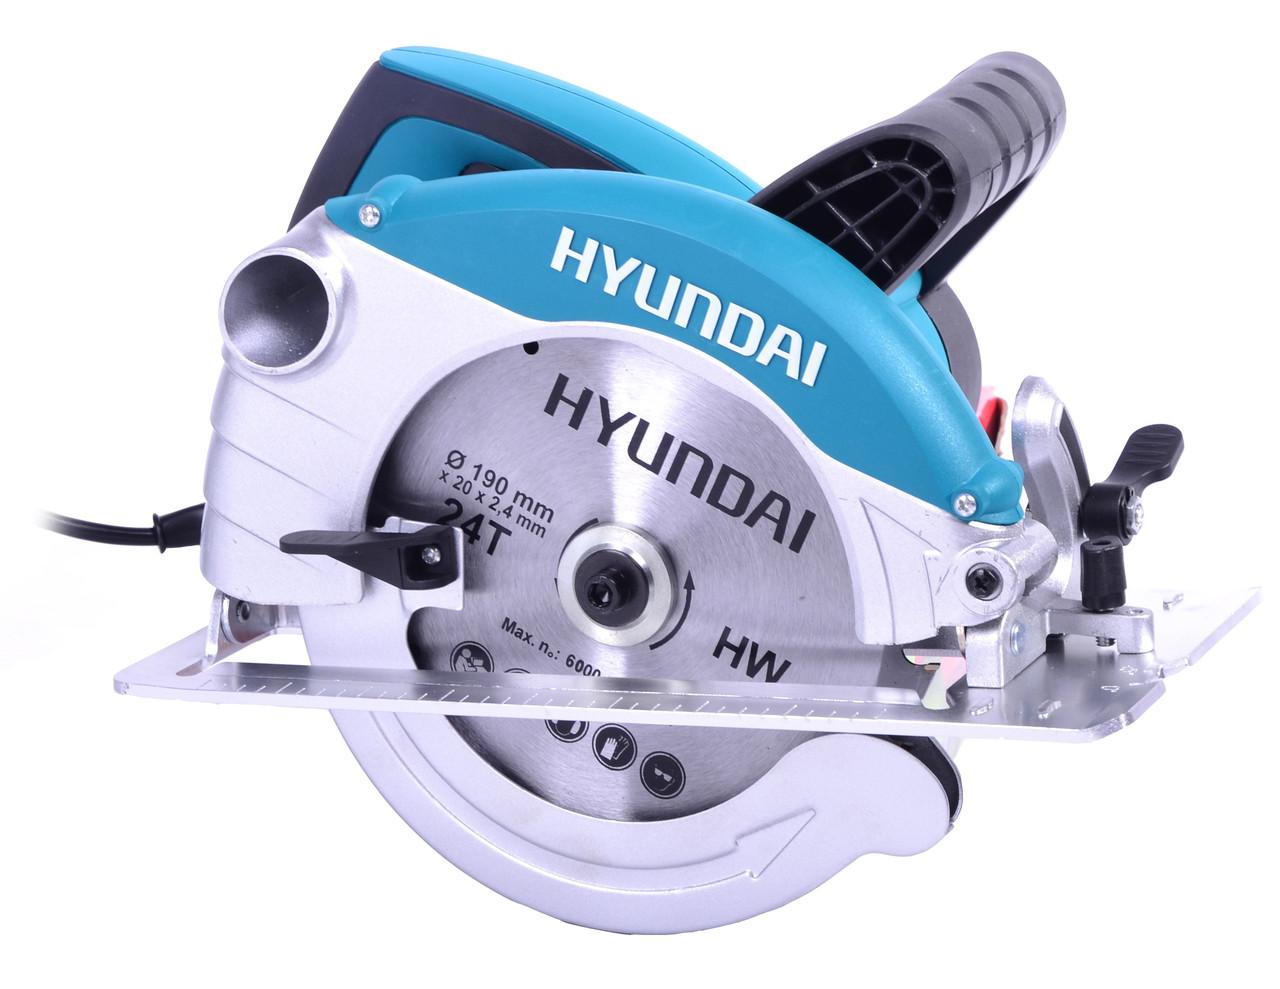 Ручная дисковая пила hyundai C 1500-190